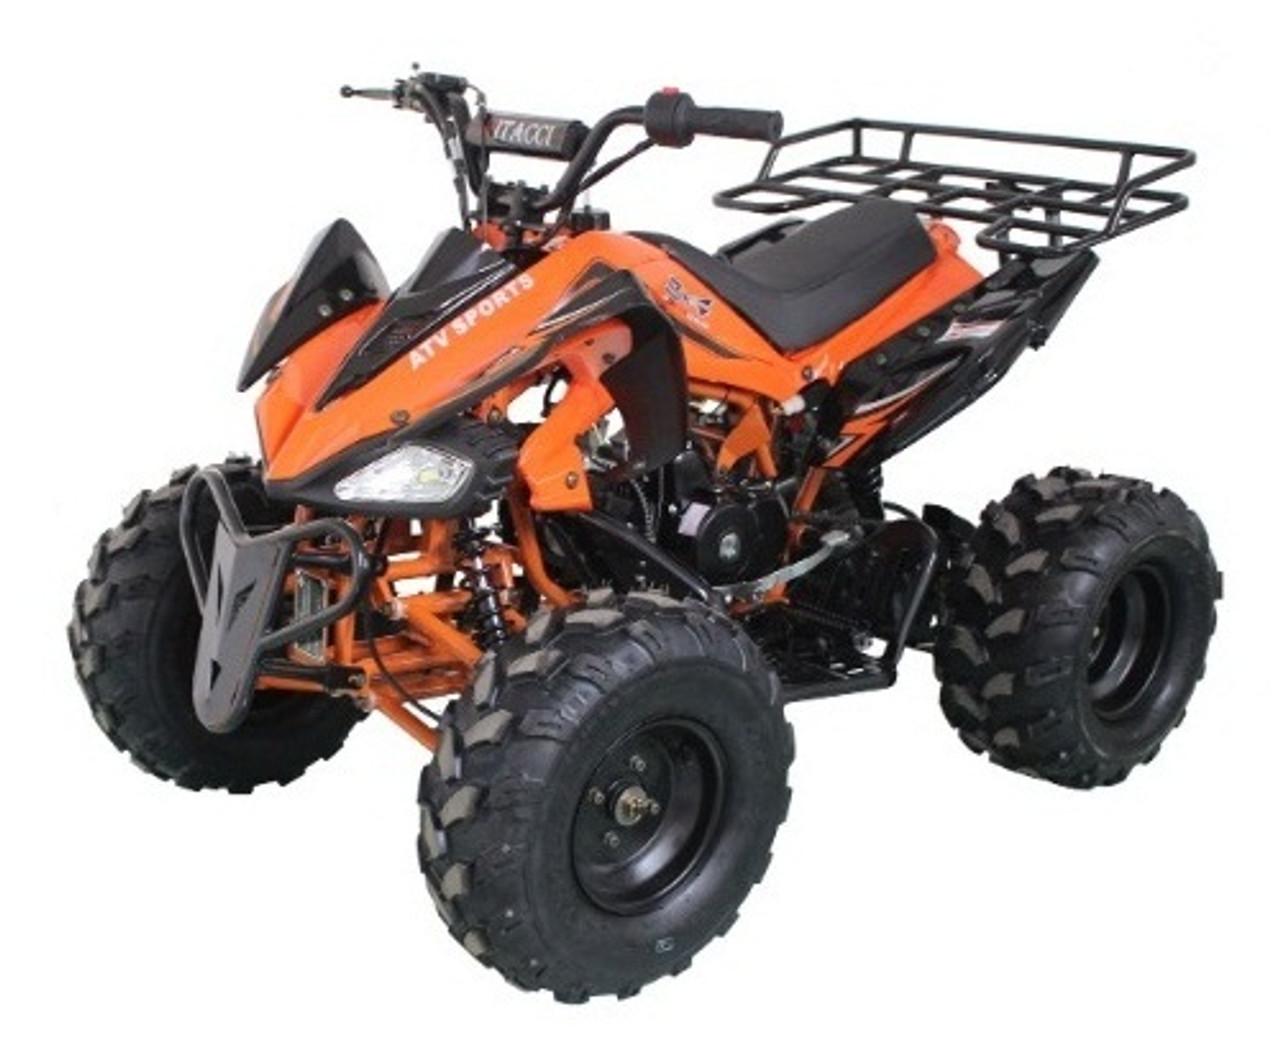 RPS High End JET-9 125cc ATV w/Steel Rims, Single Cylinder, 4 Stroke